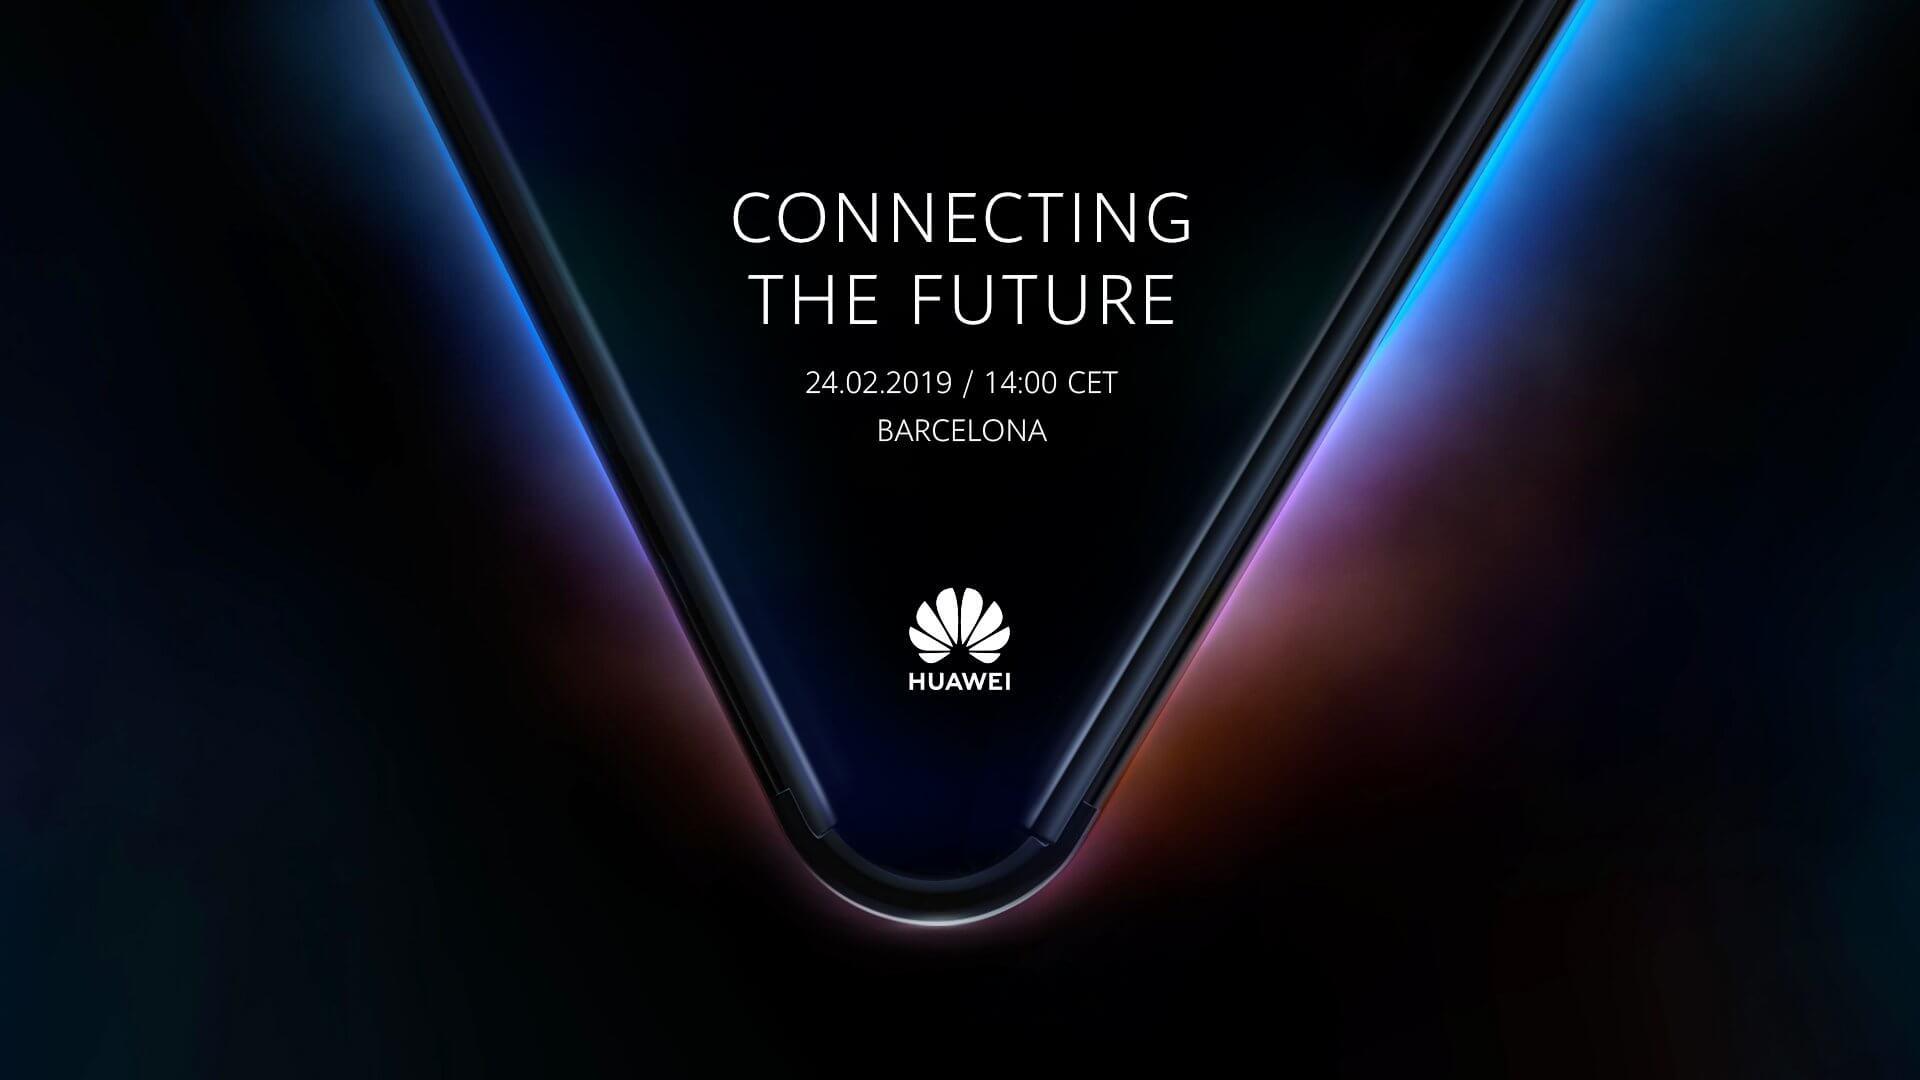 huawei foldable phone 5g mwc 2019